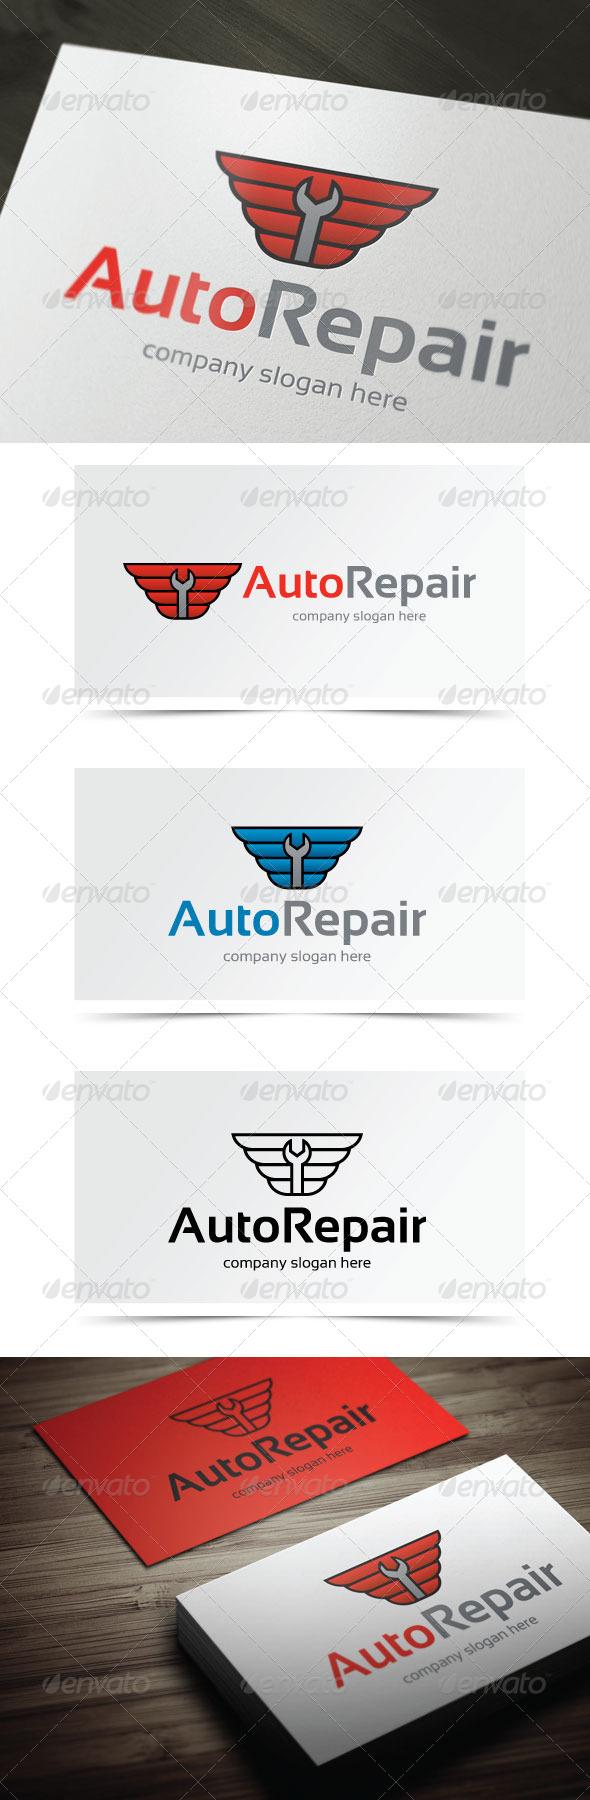 GraphicRiver Auto Repair 5445158